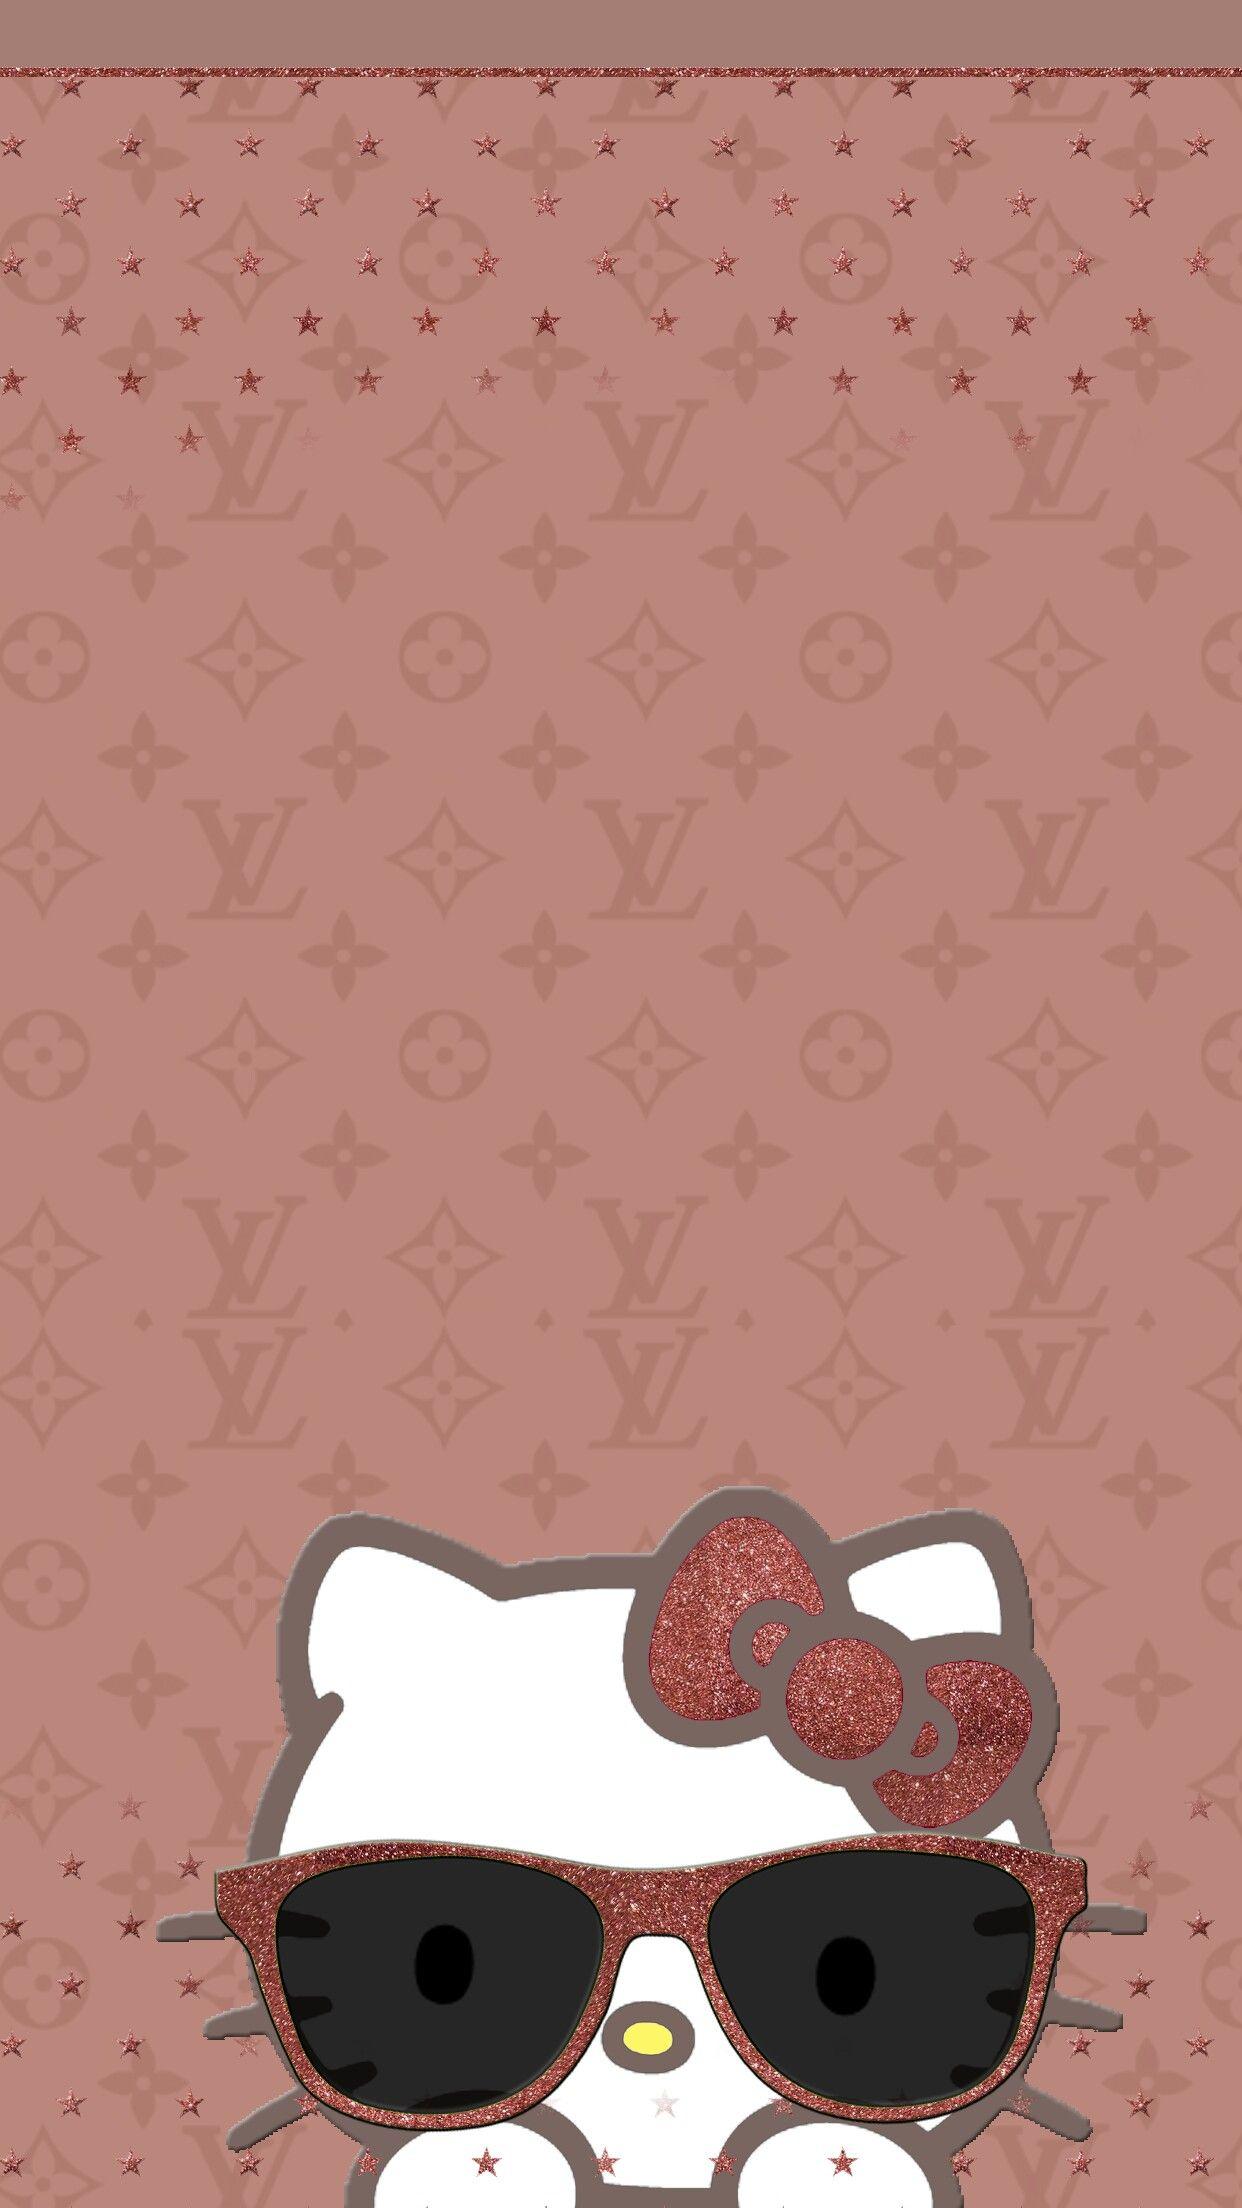 Download Wallpaper Hello Kitty Wall - 3ca8e924917dfe3f75a2237dcb12b5f4  Snapshot_869573.jpg